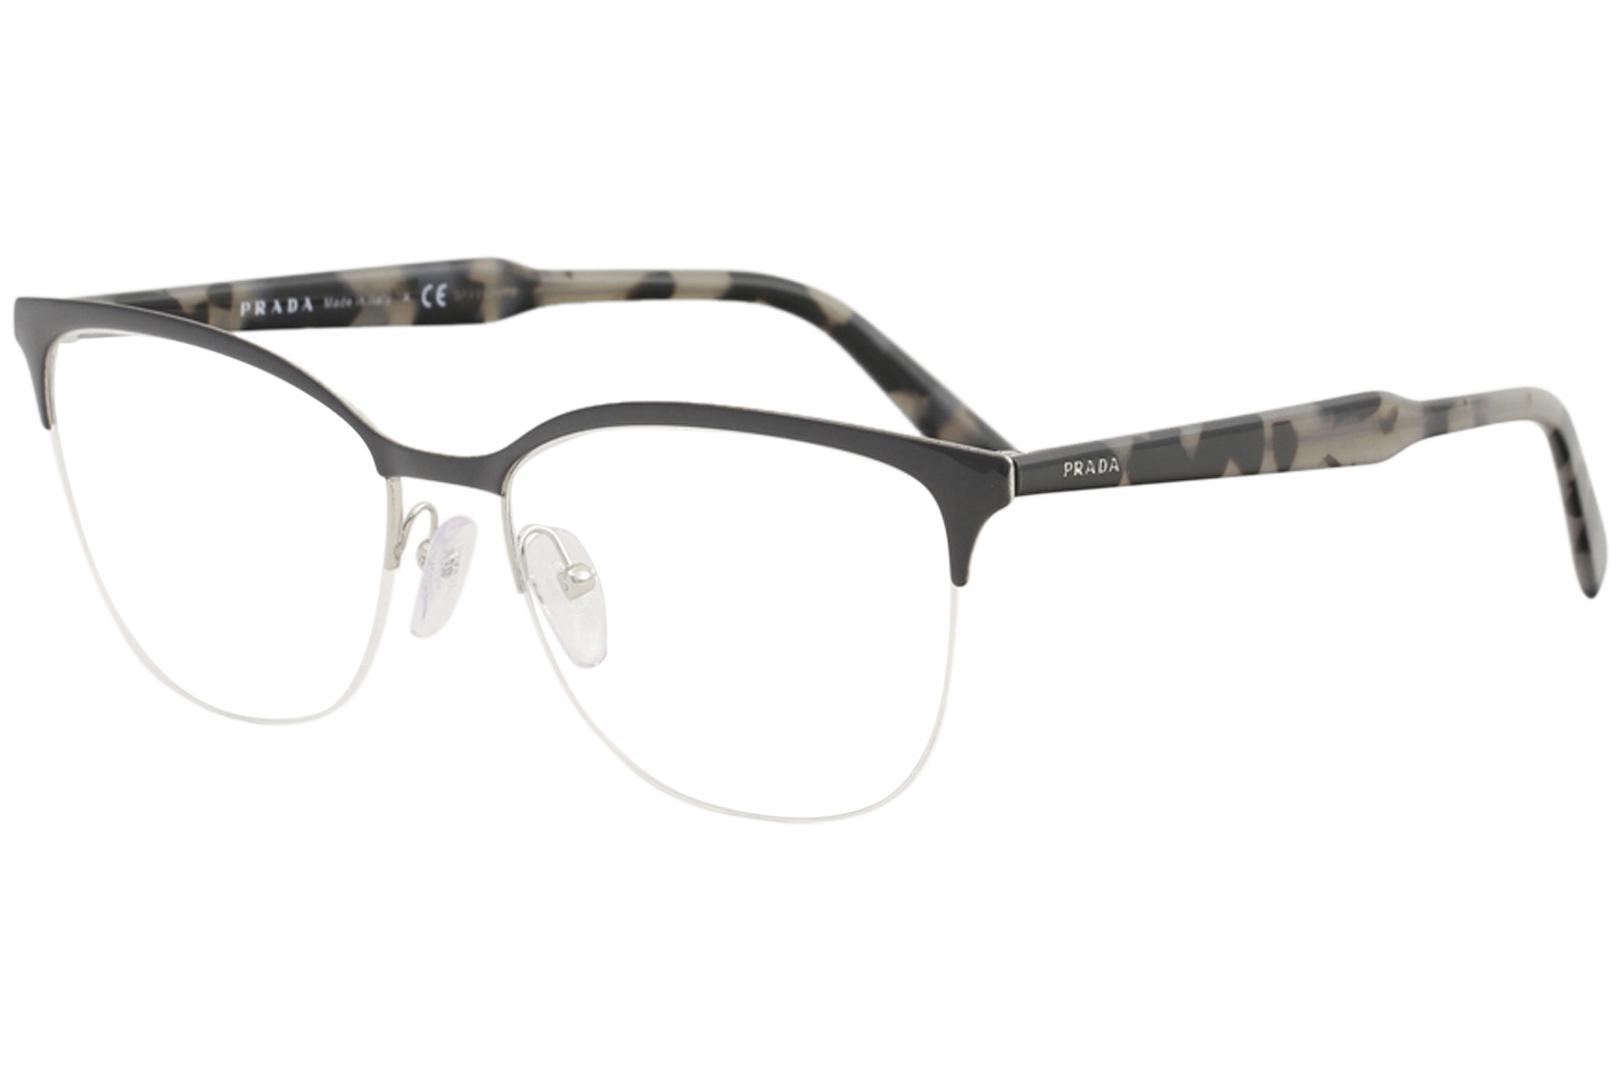 7b67f6fbf68d Prada Men s Eyeglasses VPR53V VPR 53 V 262 1O1 Grey Silver Optical ...